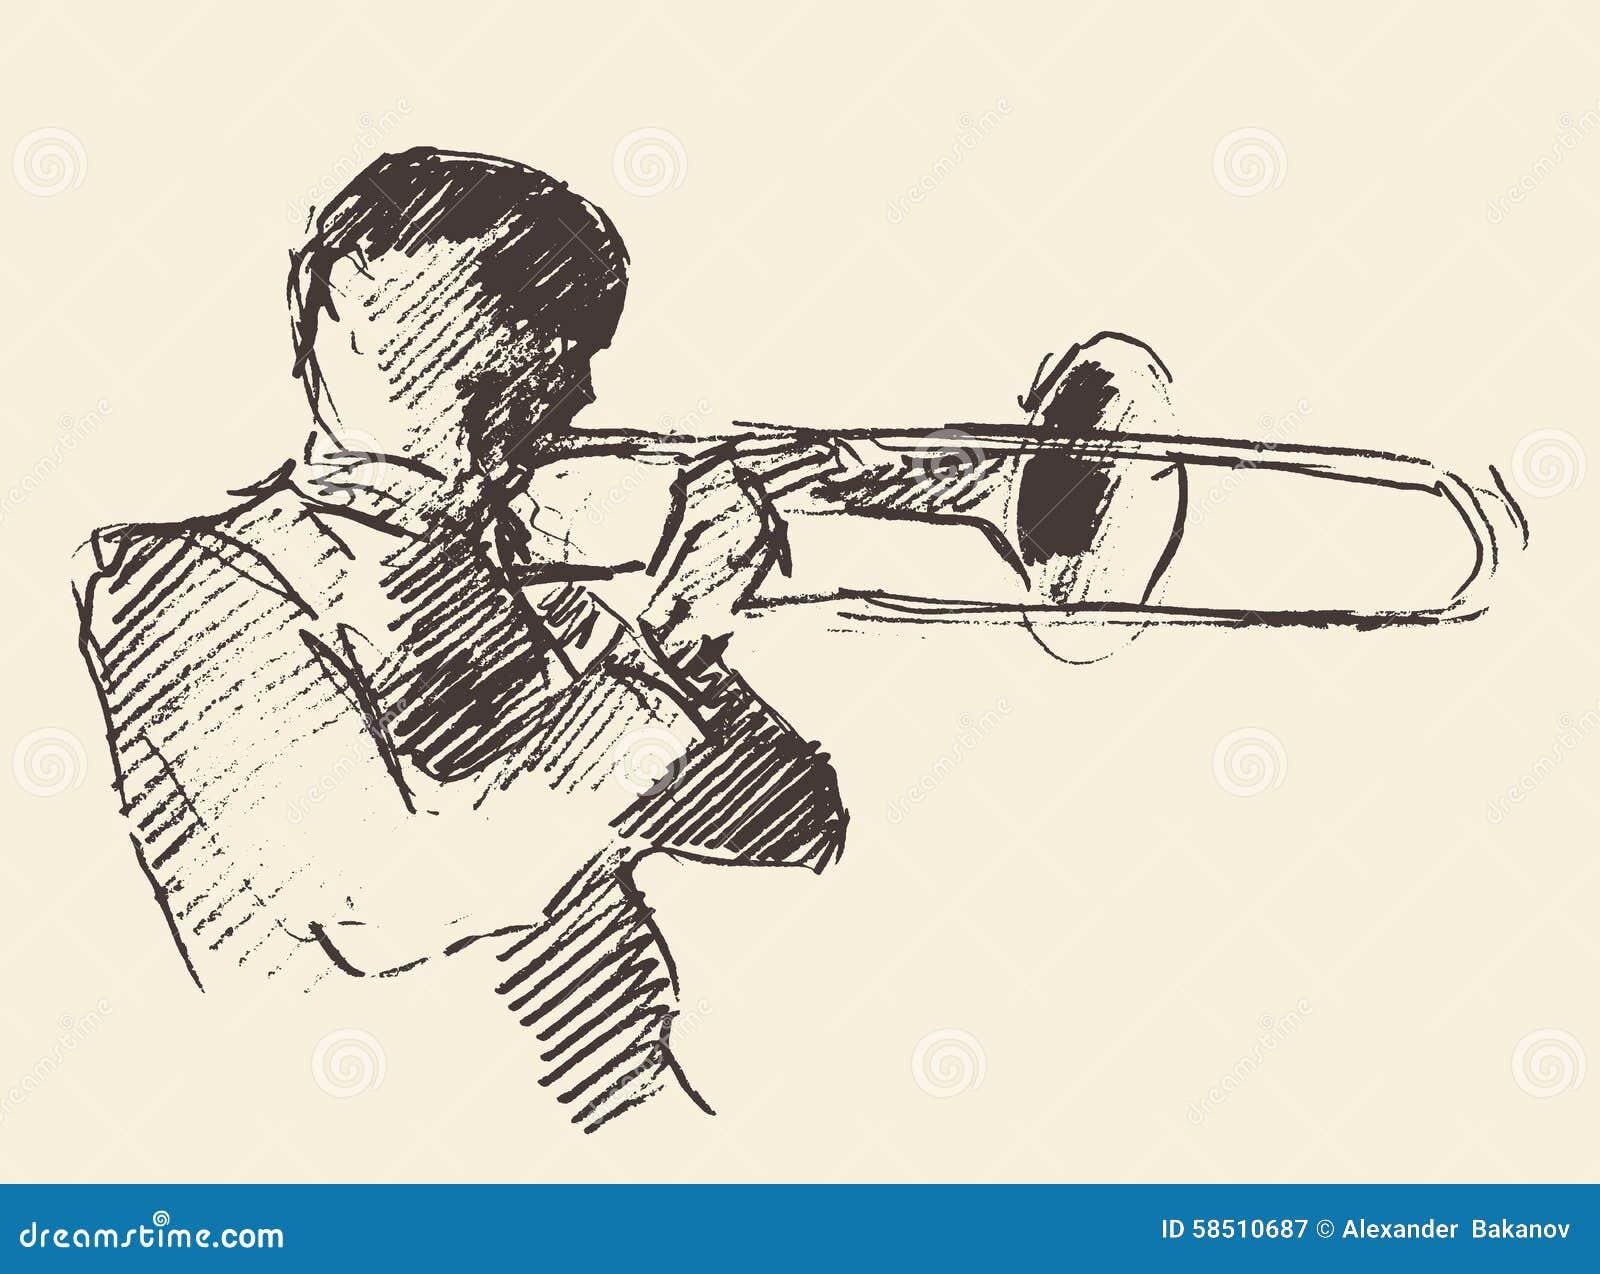 Jazz Poster Trombone Music Acoustic Stock Vector ...  Jazz Poster Tro...